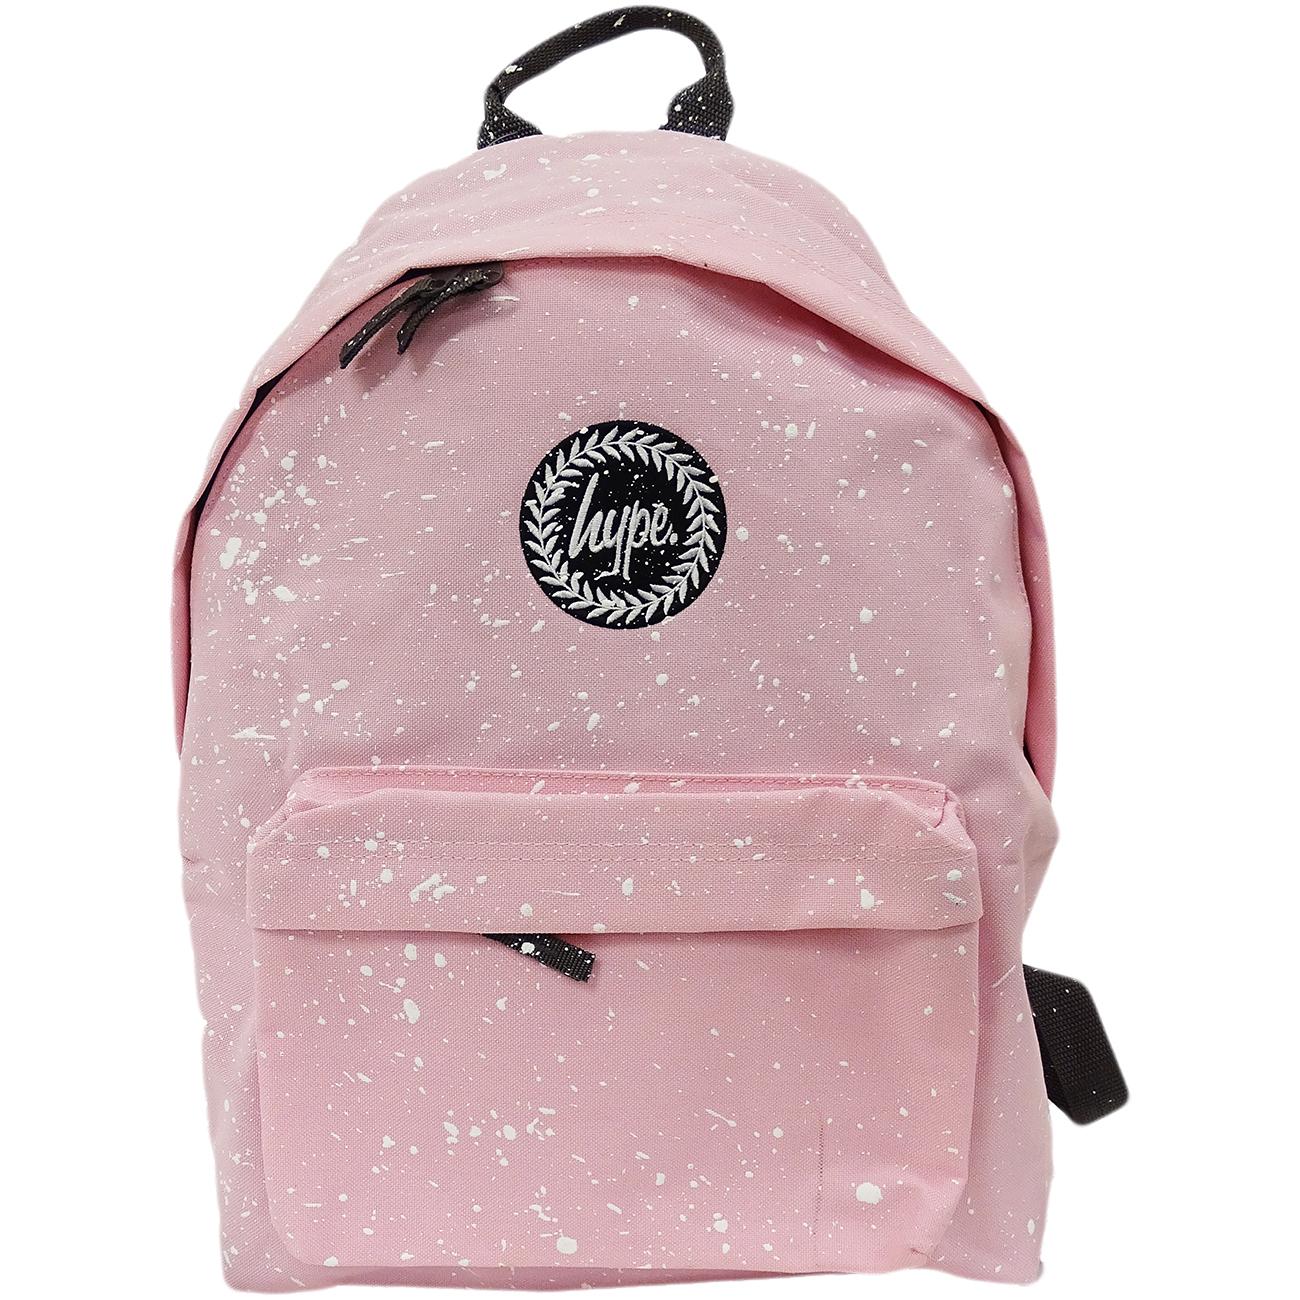 Hype Backpack Bag - School / Work / Gym Backpack - Baby Pink